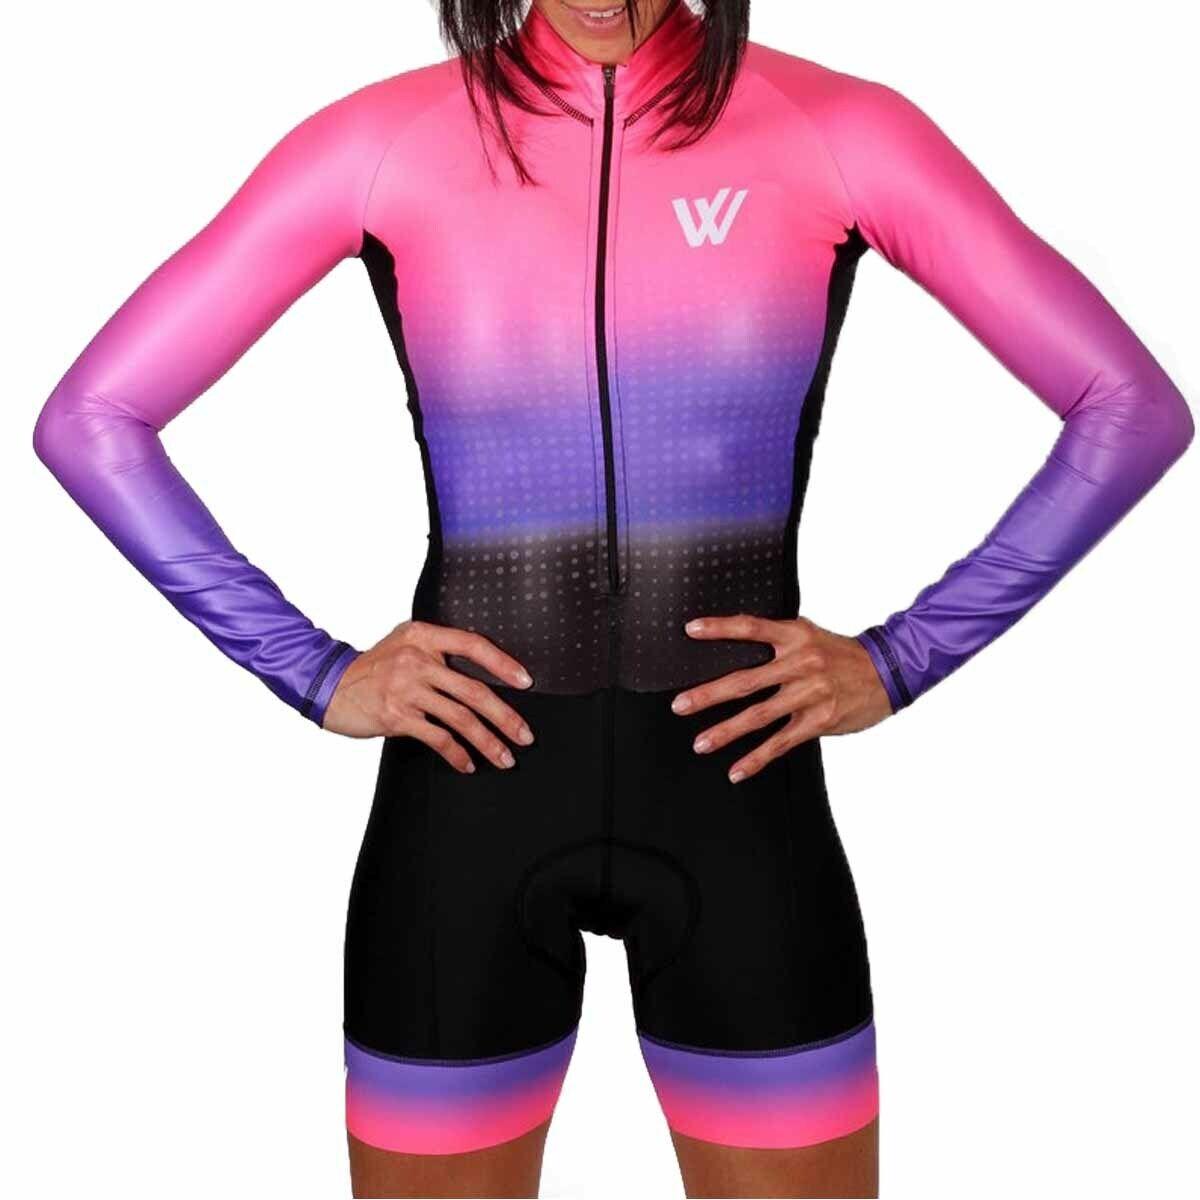 Women Cycling Jersey Suit Set Skinsuit Triathlon Tri Swim Run Race Pink Gel Pad